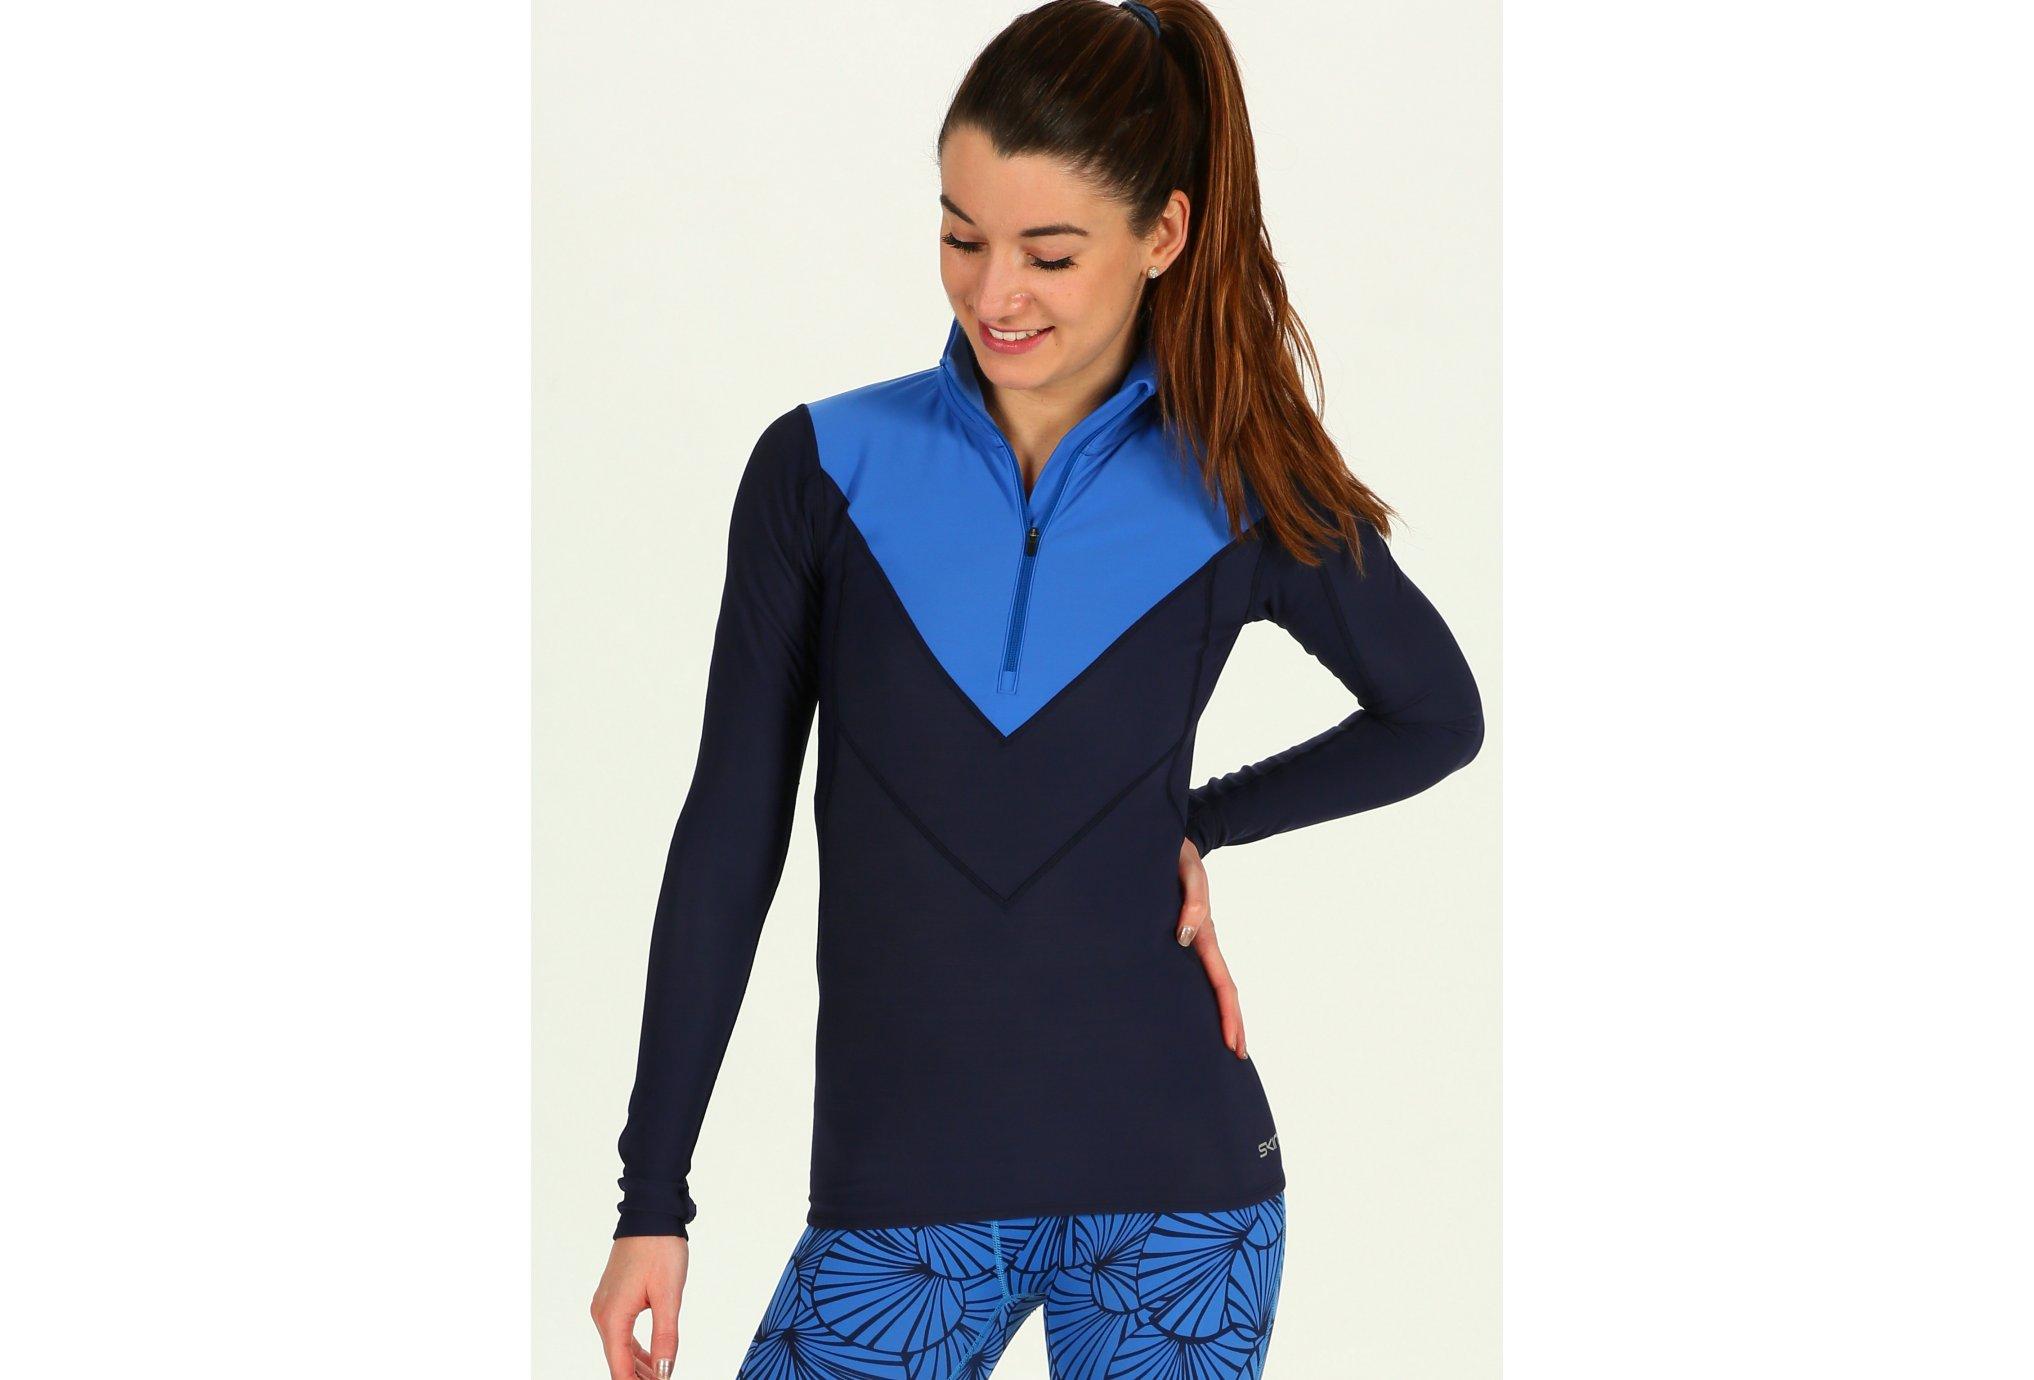 Skins DNAmic Thermal Zip W vêtement running femme